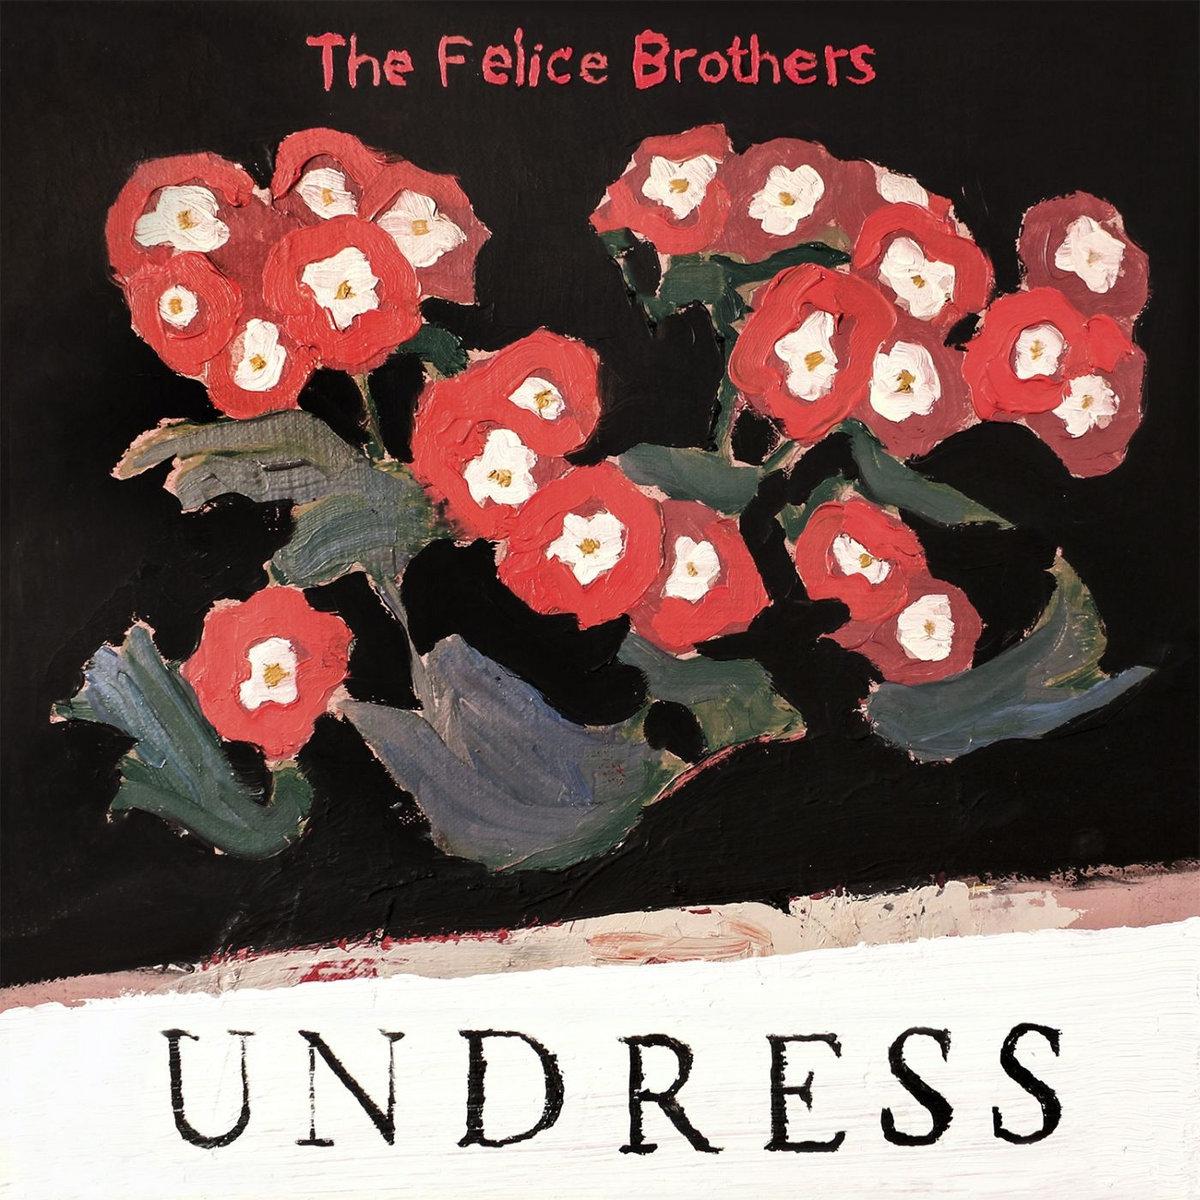 The Felice Brothers - Página 10 A2943642511_10